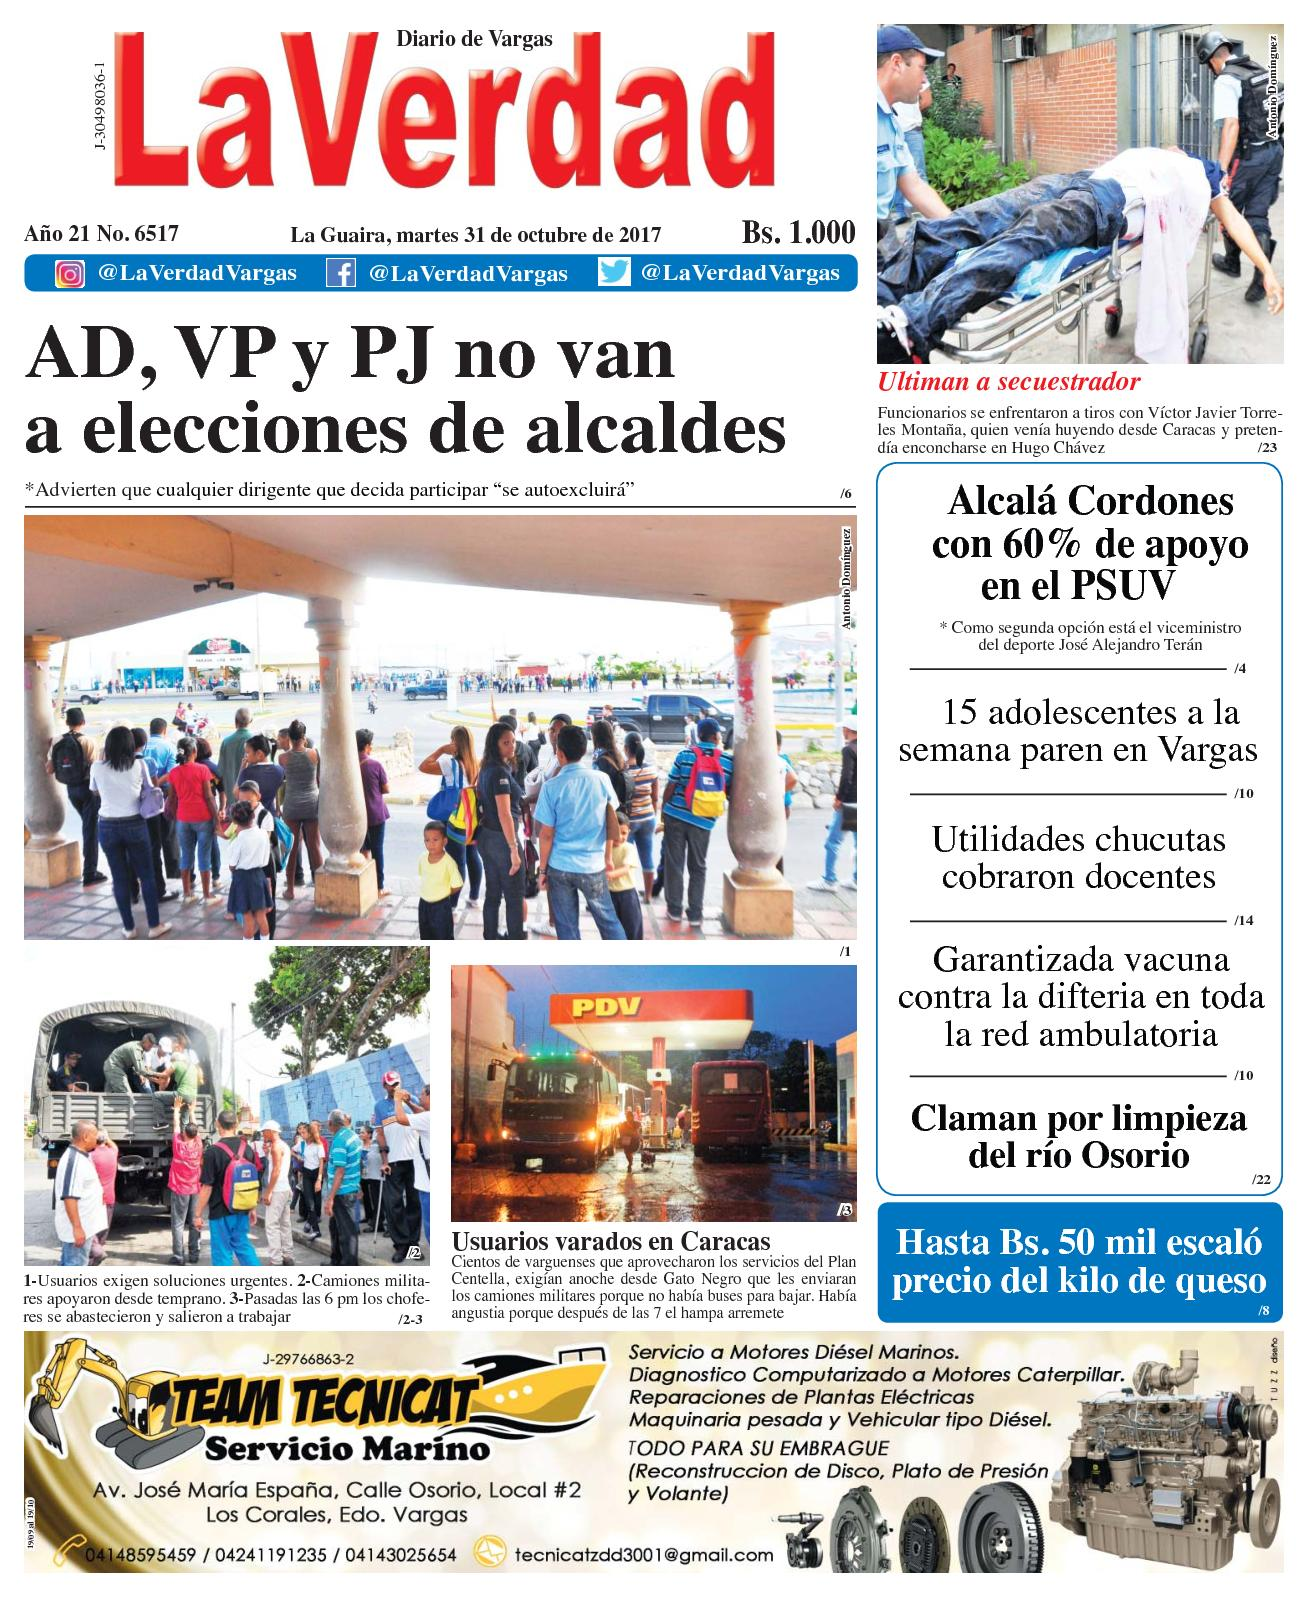 Calaméo - La Guaira, martes 31 de octubre de 2017. Año 20 No. 6517